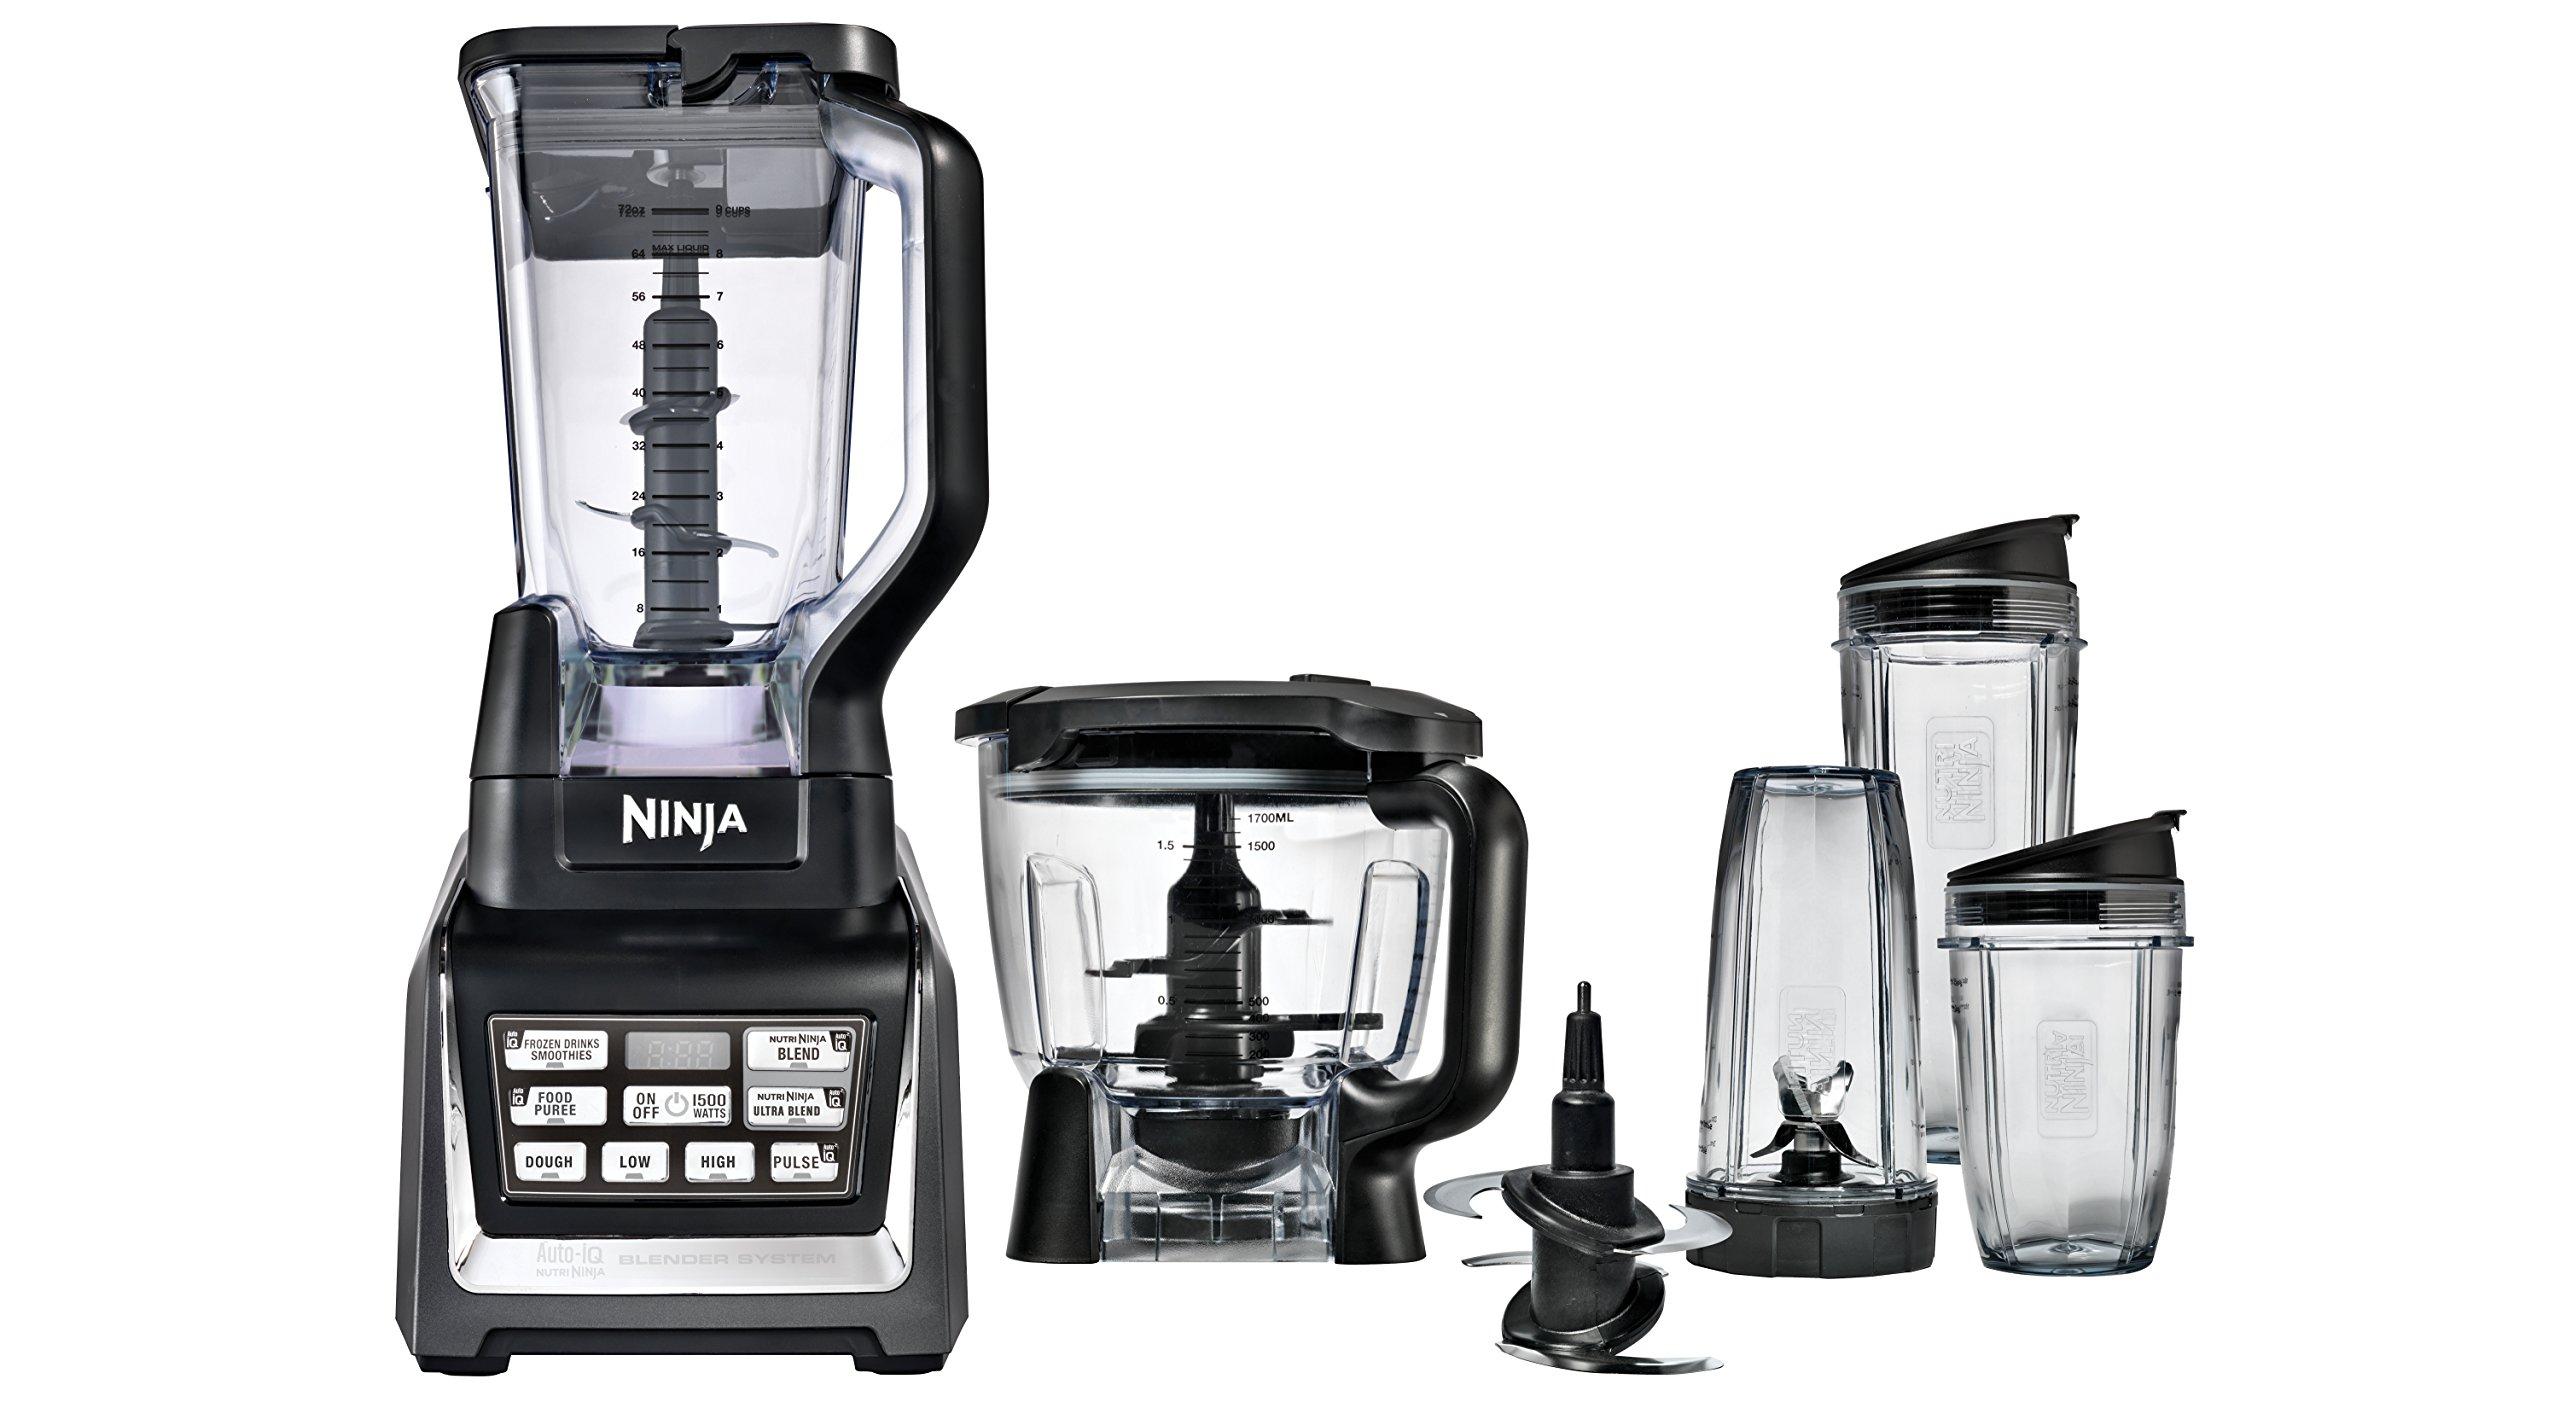 Nutri Ninja|Ninja Blender Duo System with Auto-iQ with Nutri Ninja Cups (BL682)